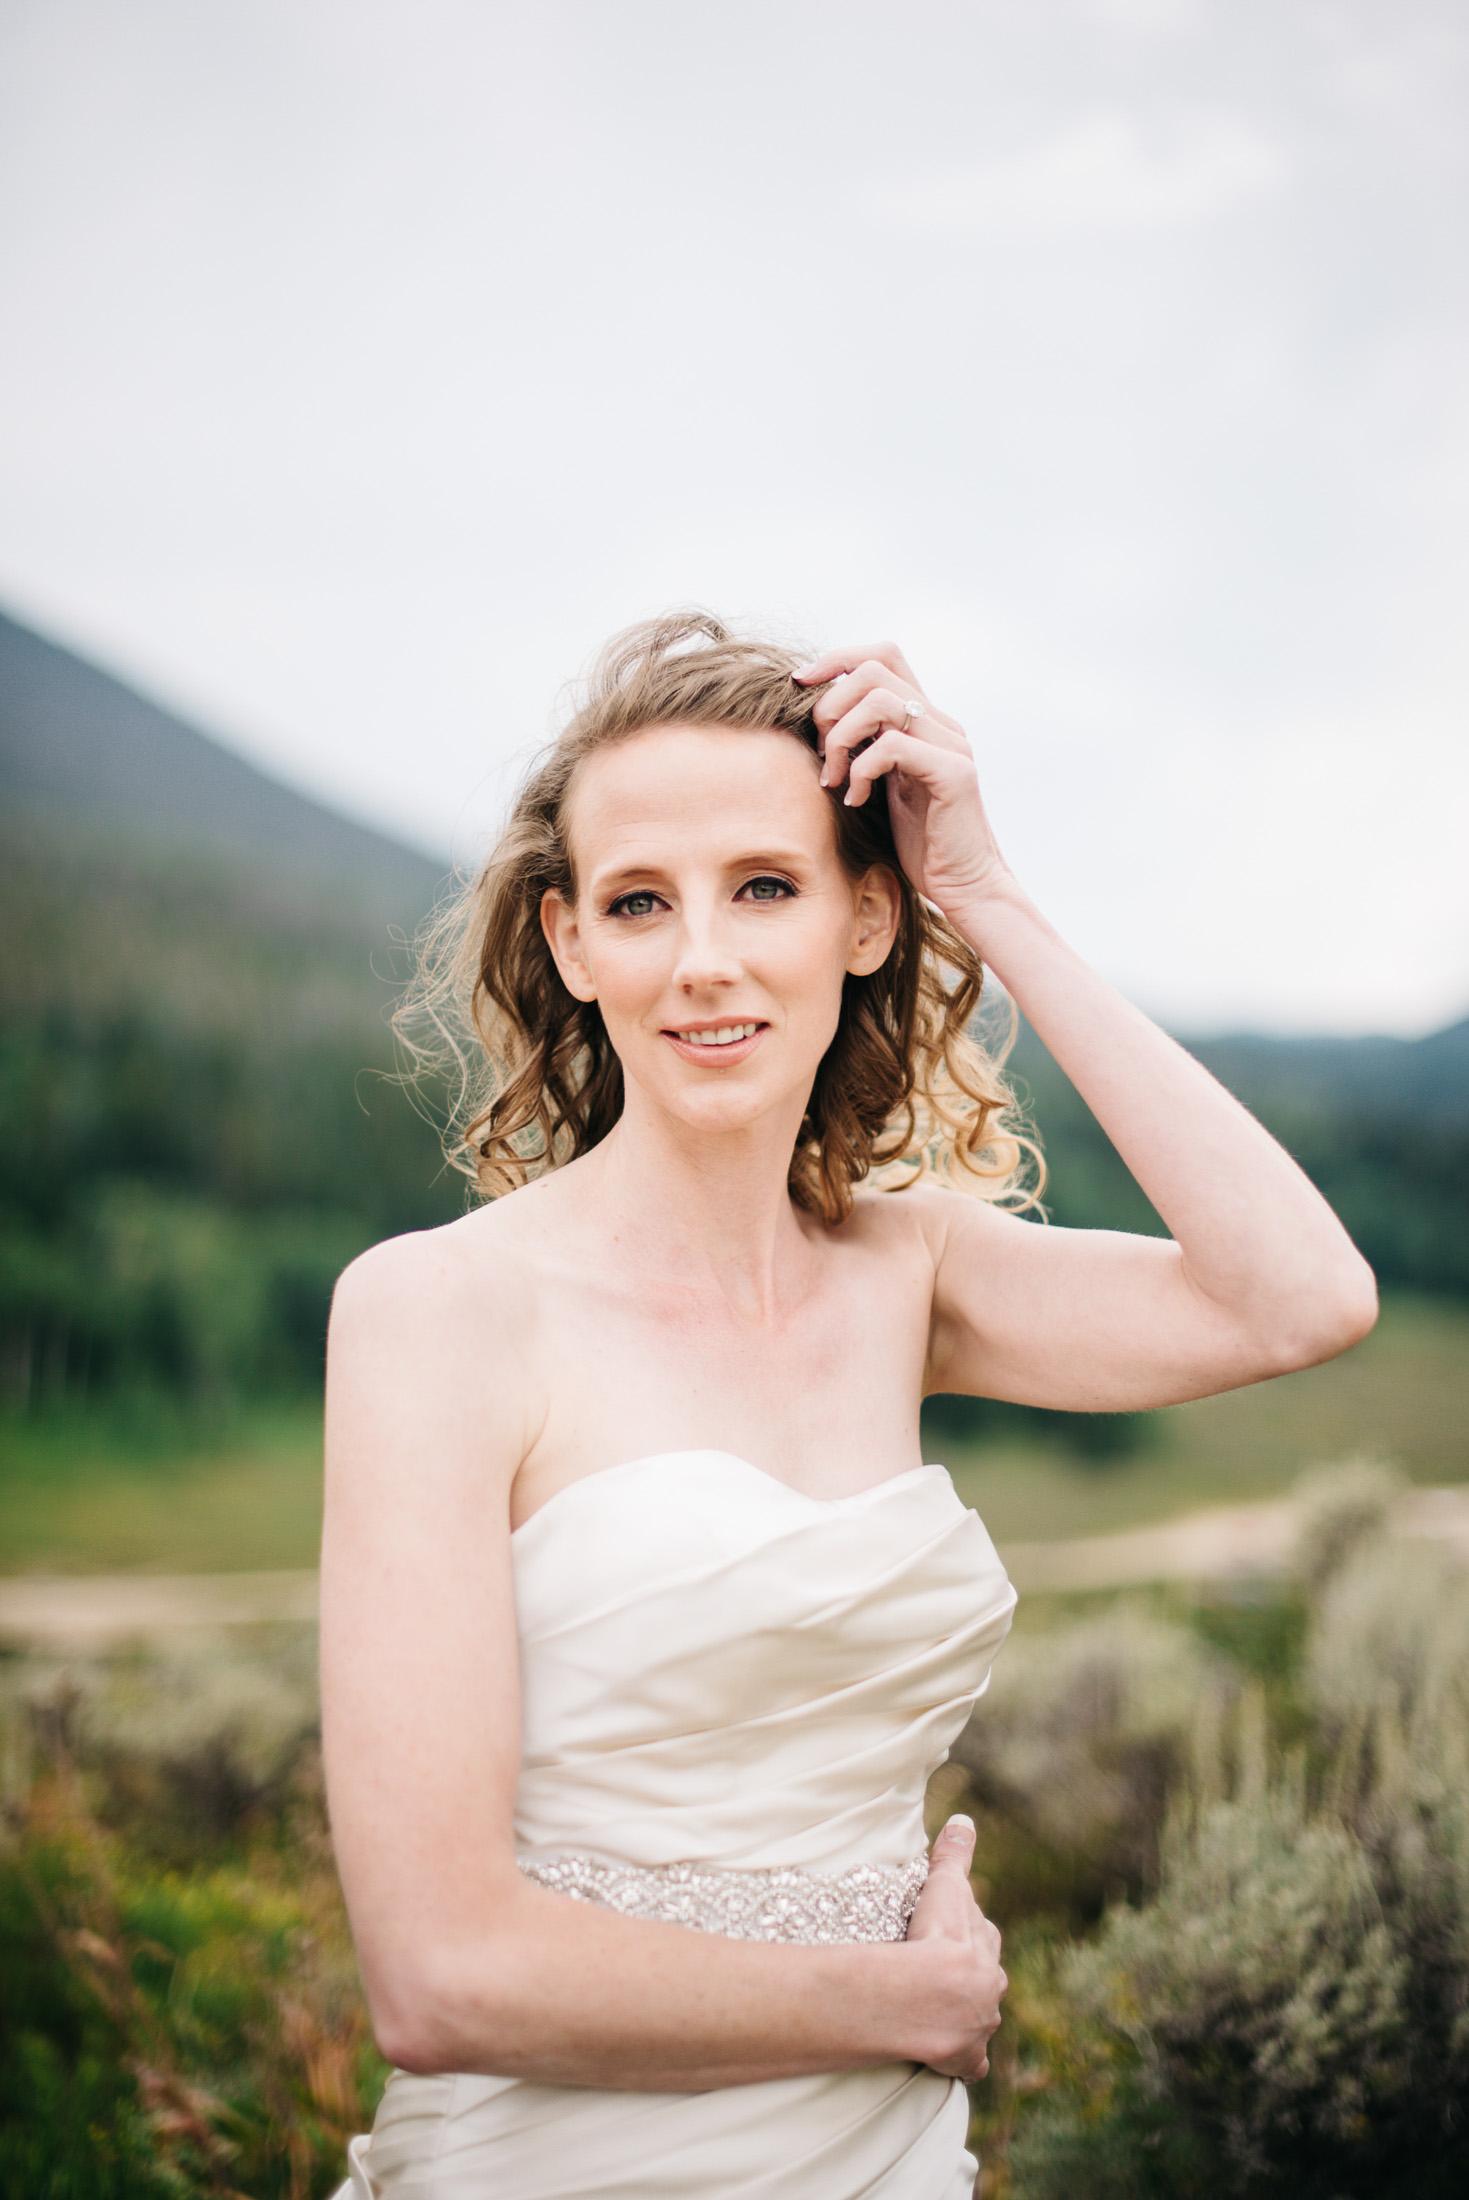 81elopement-photographer-colorado-snow-mountain-ranch-wedding-cynthia&chris-married0193.jpg